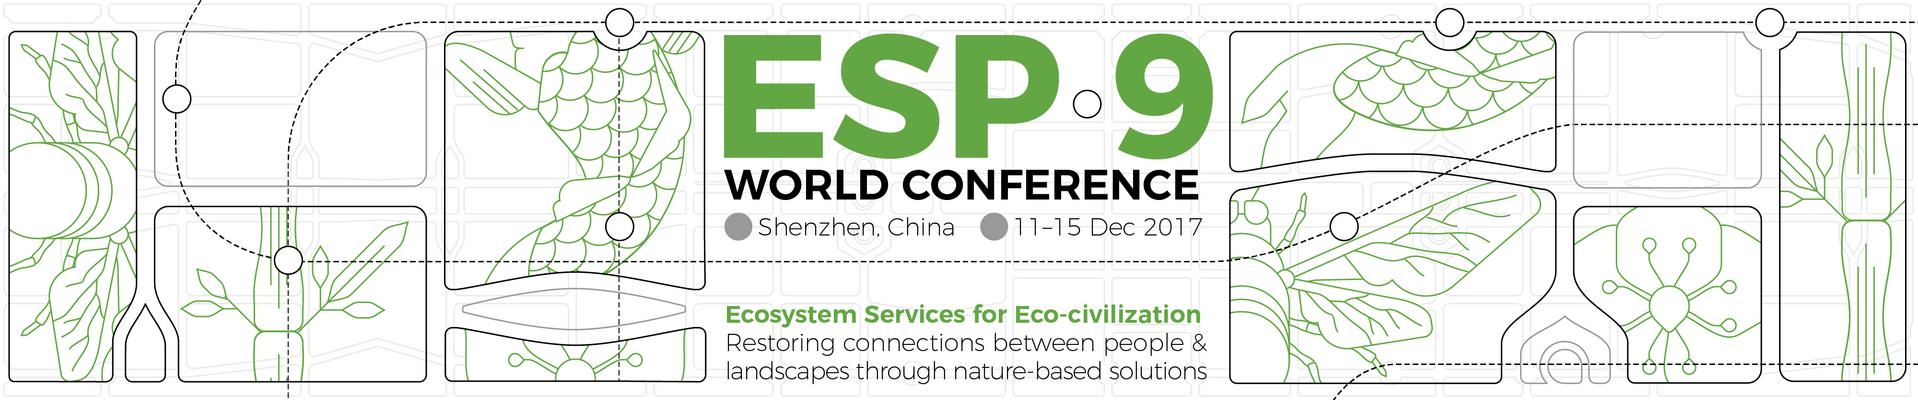 ESP9 Conference 2017